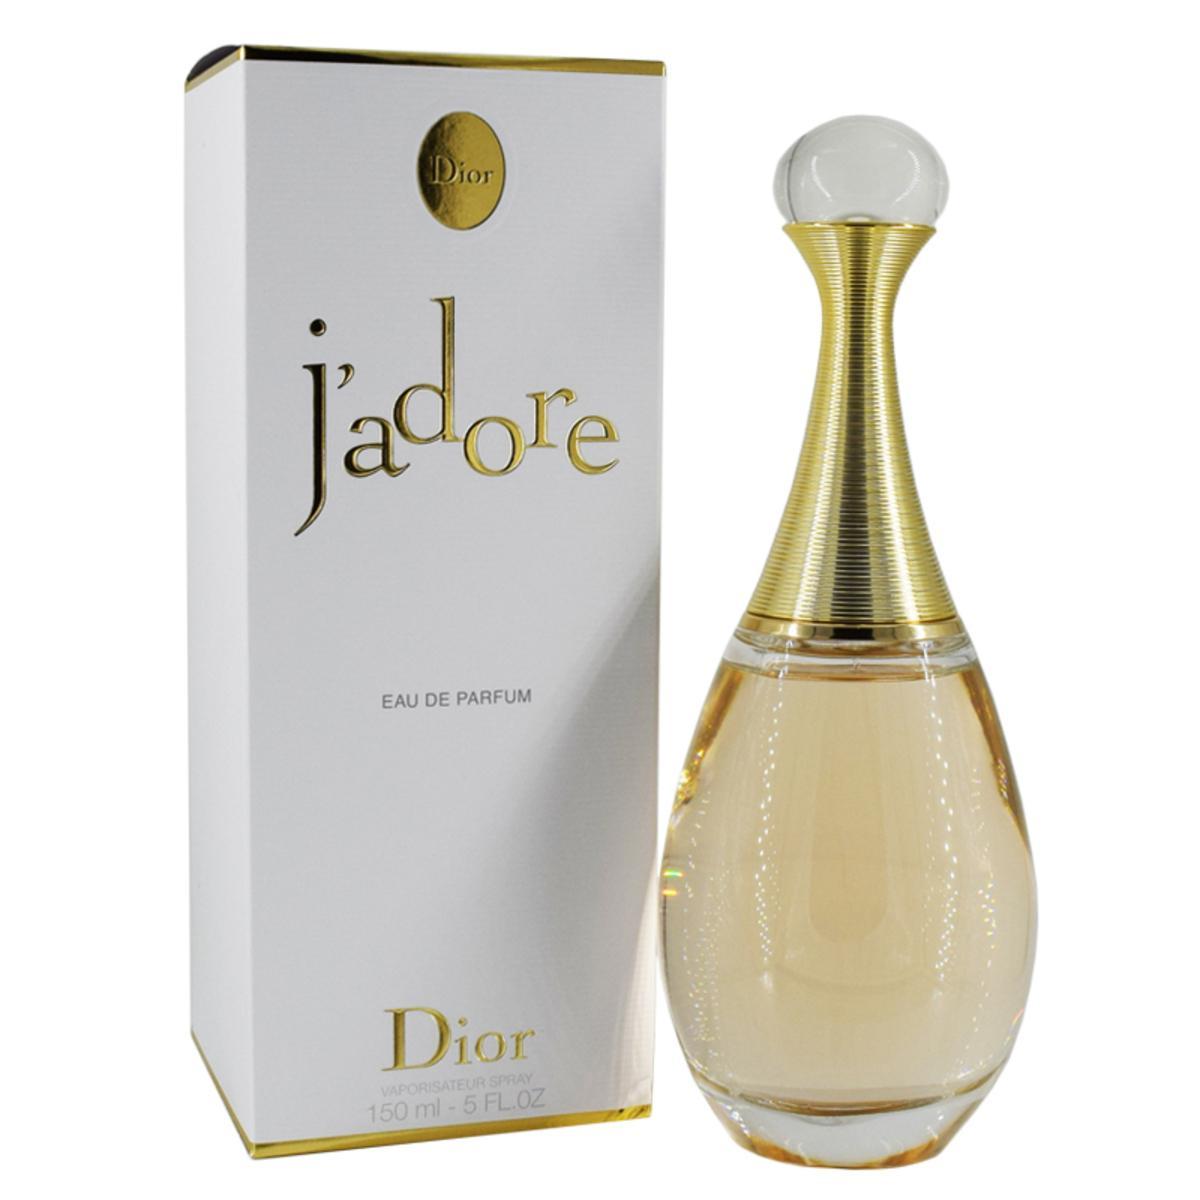 Christian Dior Fragrances Classy Distinctive Lazada